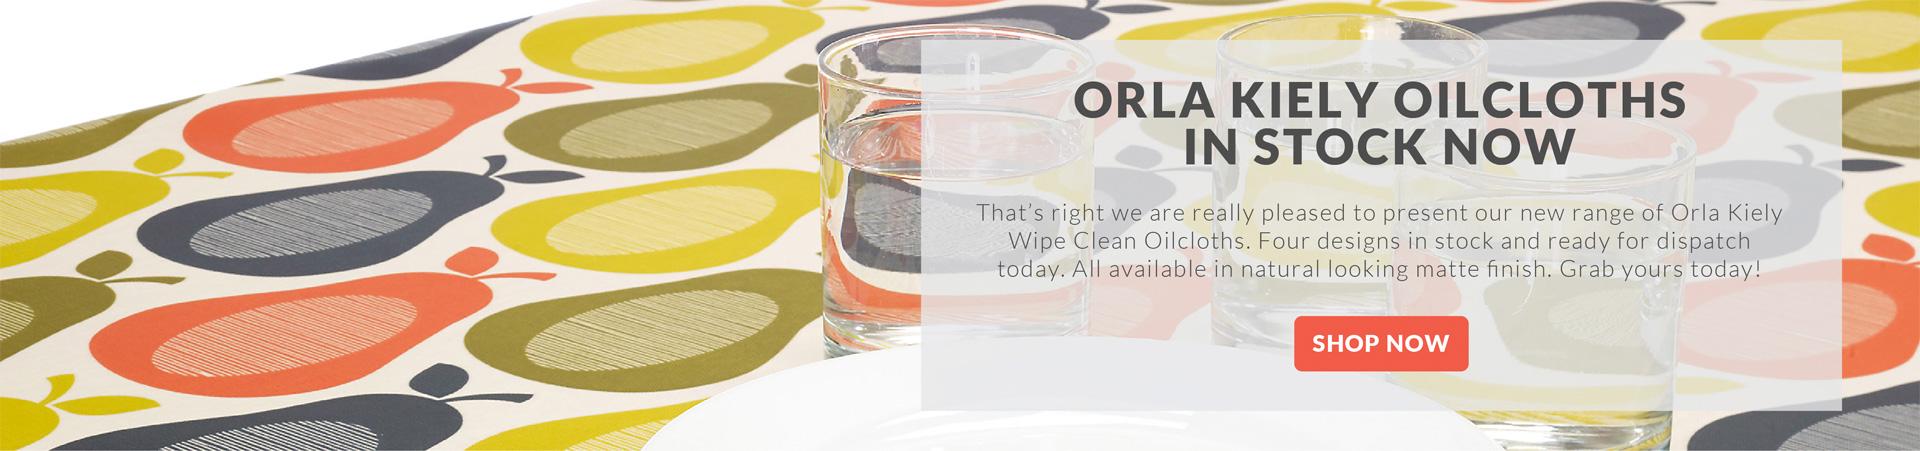 Orla Kiely Oilcloth